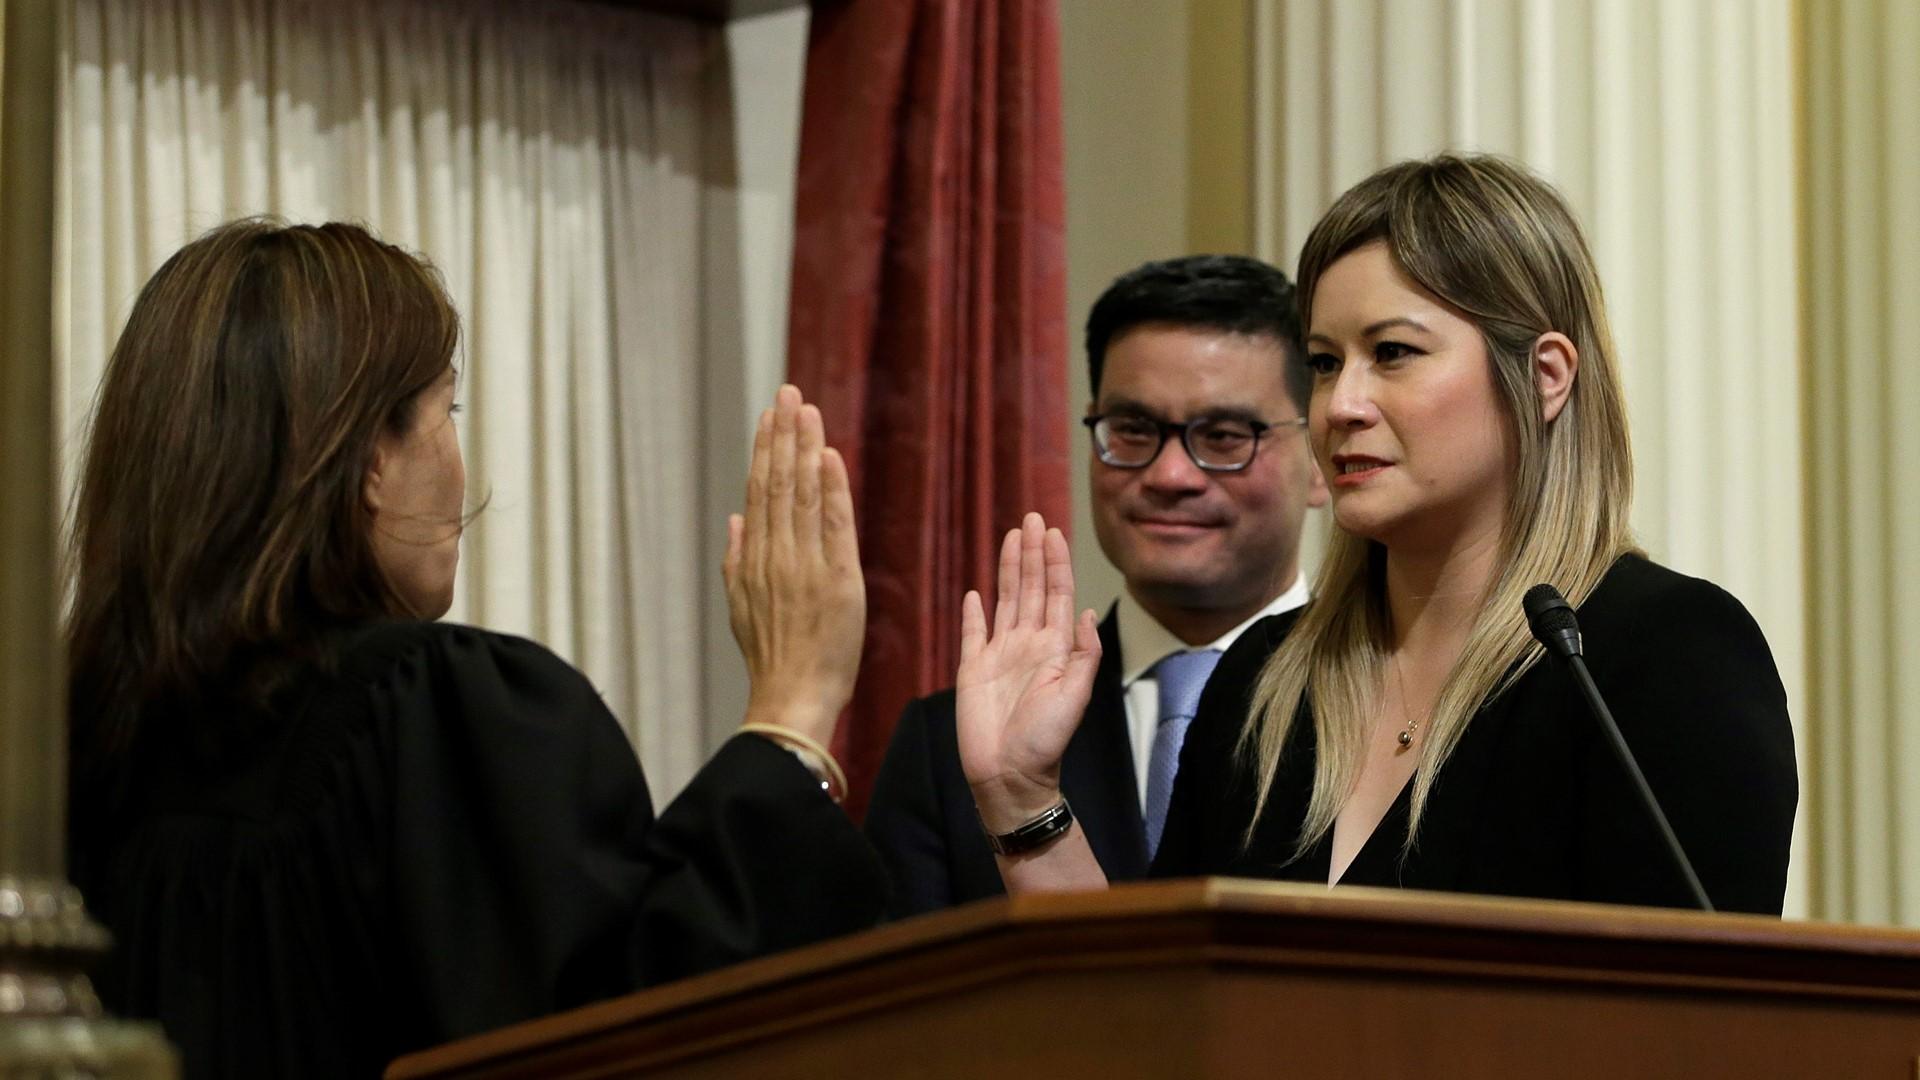 California lawmaker wants to ban sending unwanted nude